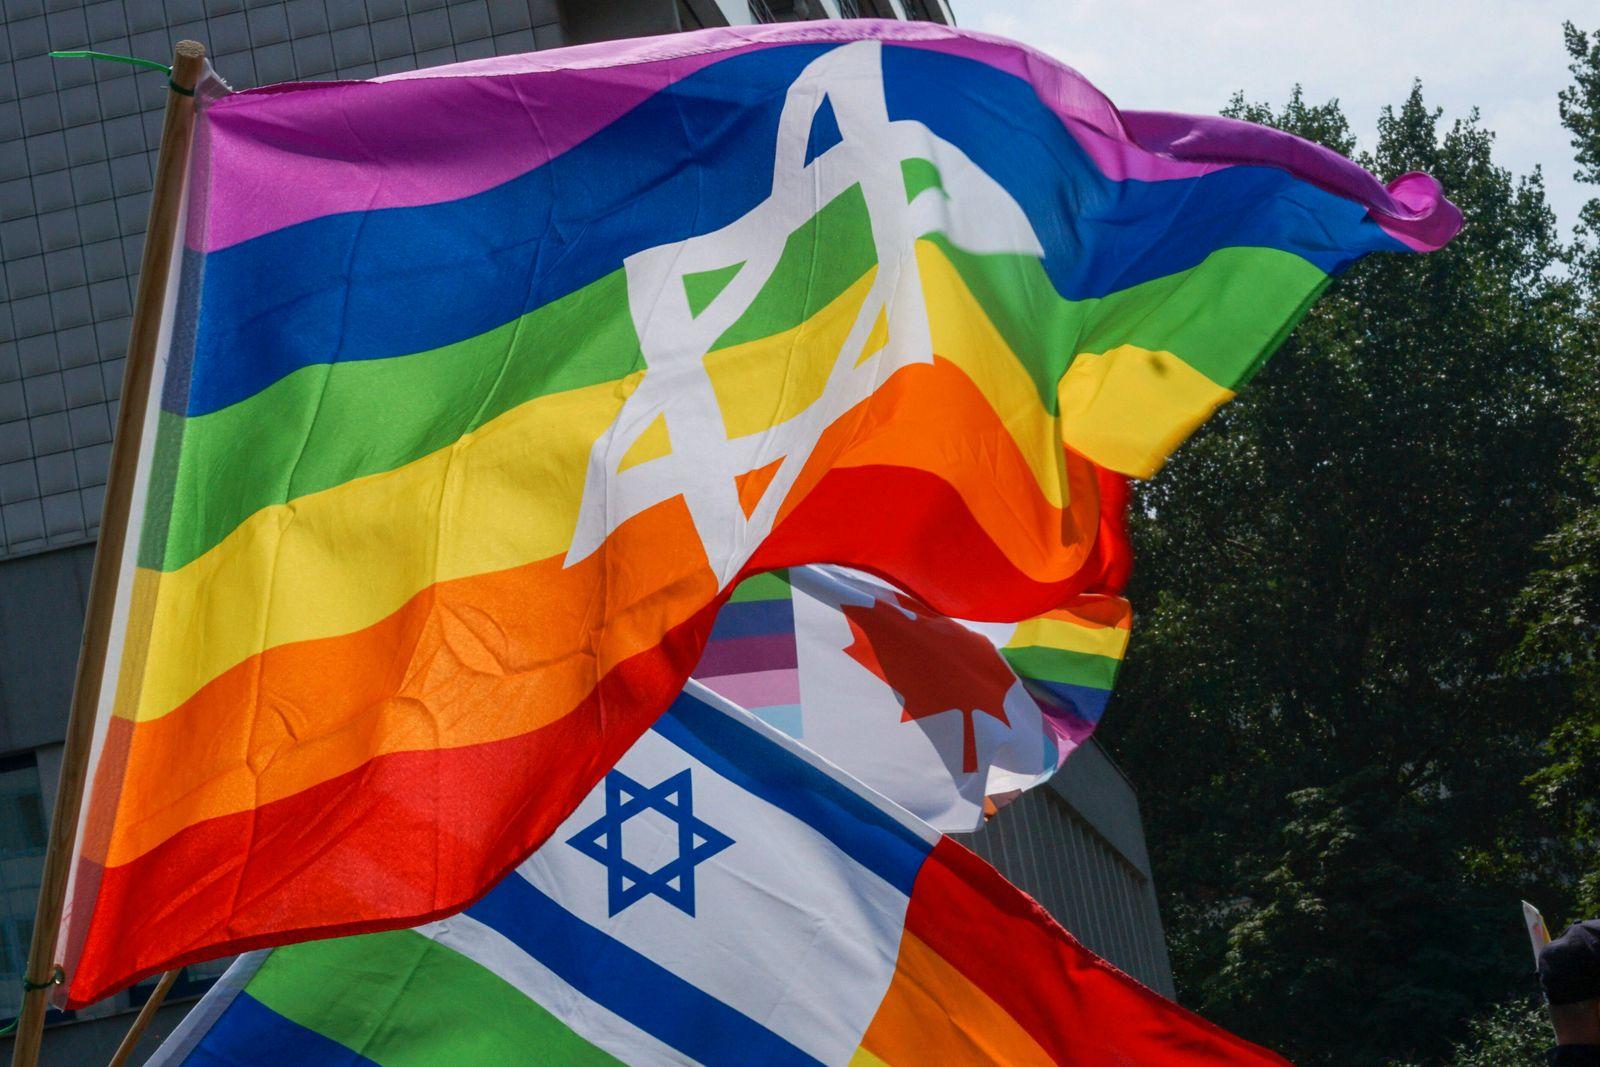 Berlin, Deutschland 24. Juli 2021: Regenbogenflagge mit Israelflagge und Davidsstern Berlin *** Berlin, Germany 24 July